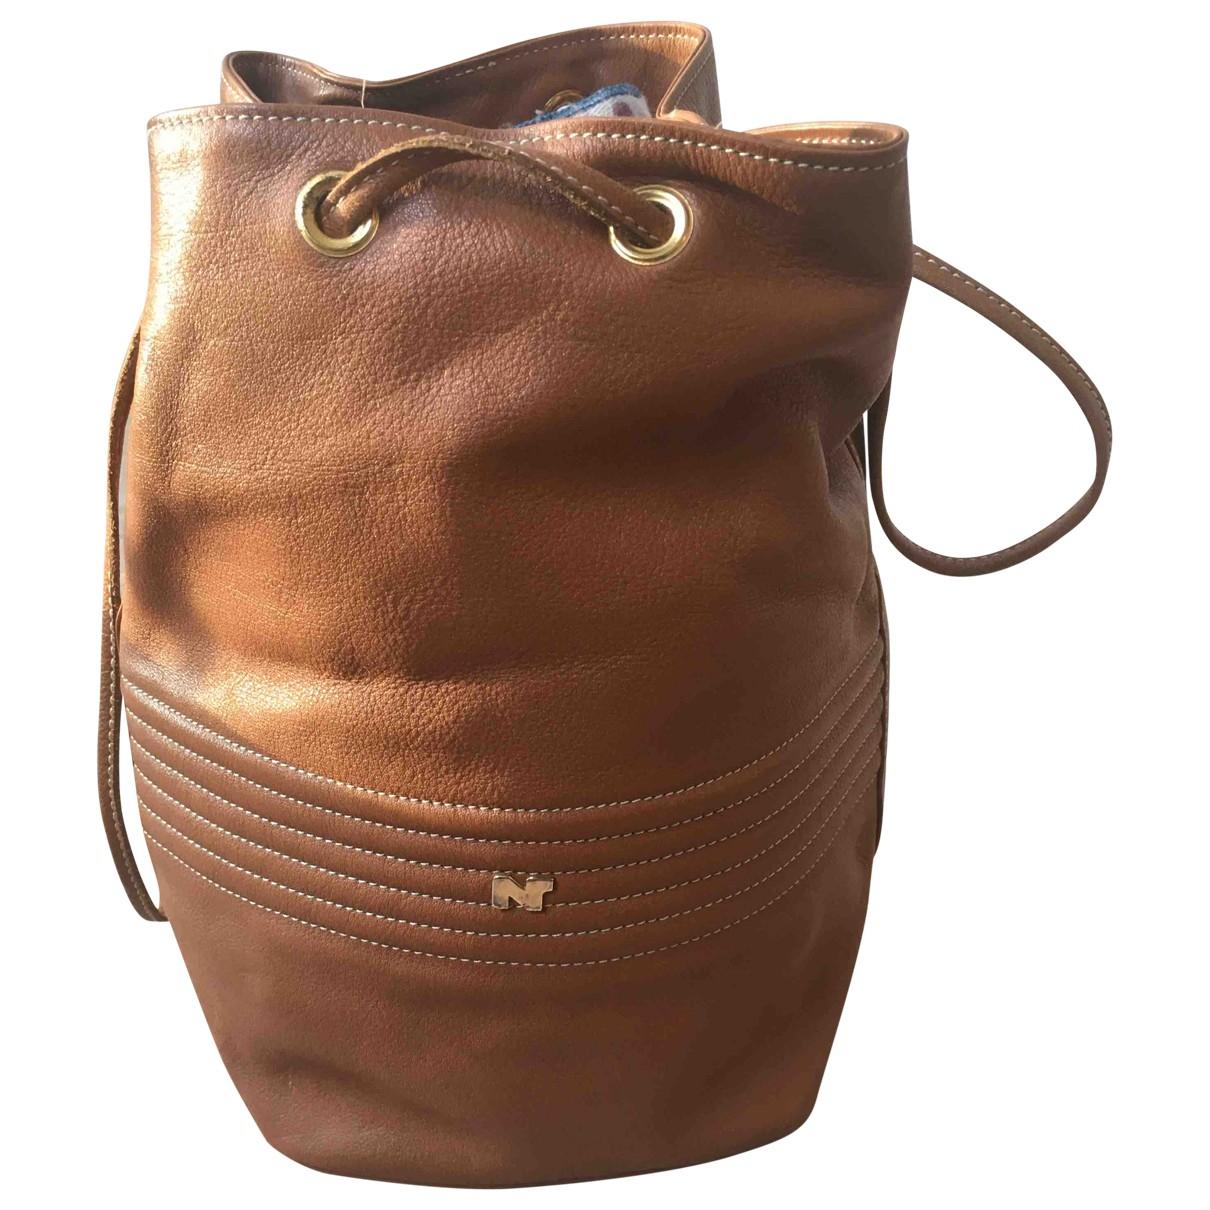 Nina Ricci \N Camel Leather handbag for Women \N